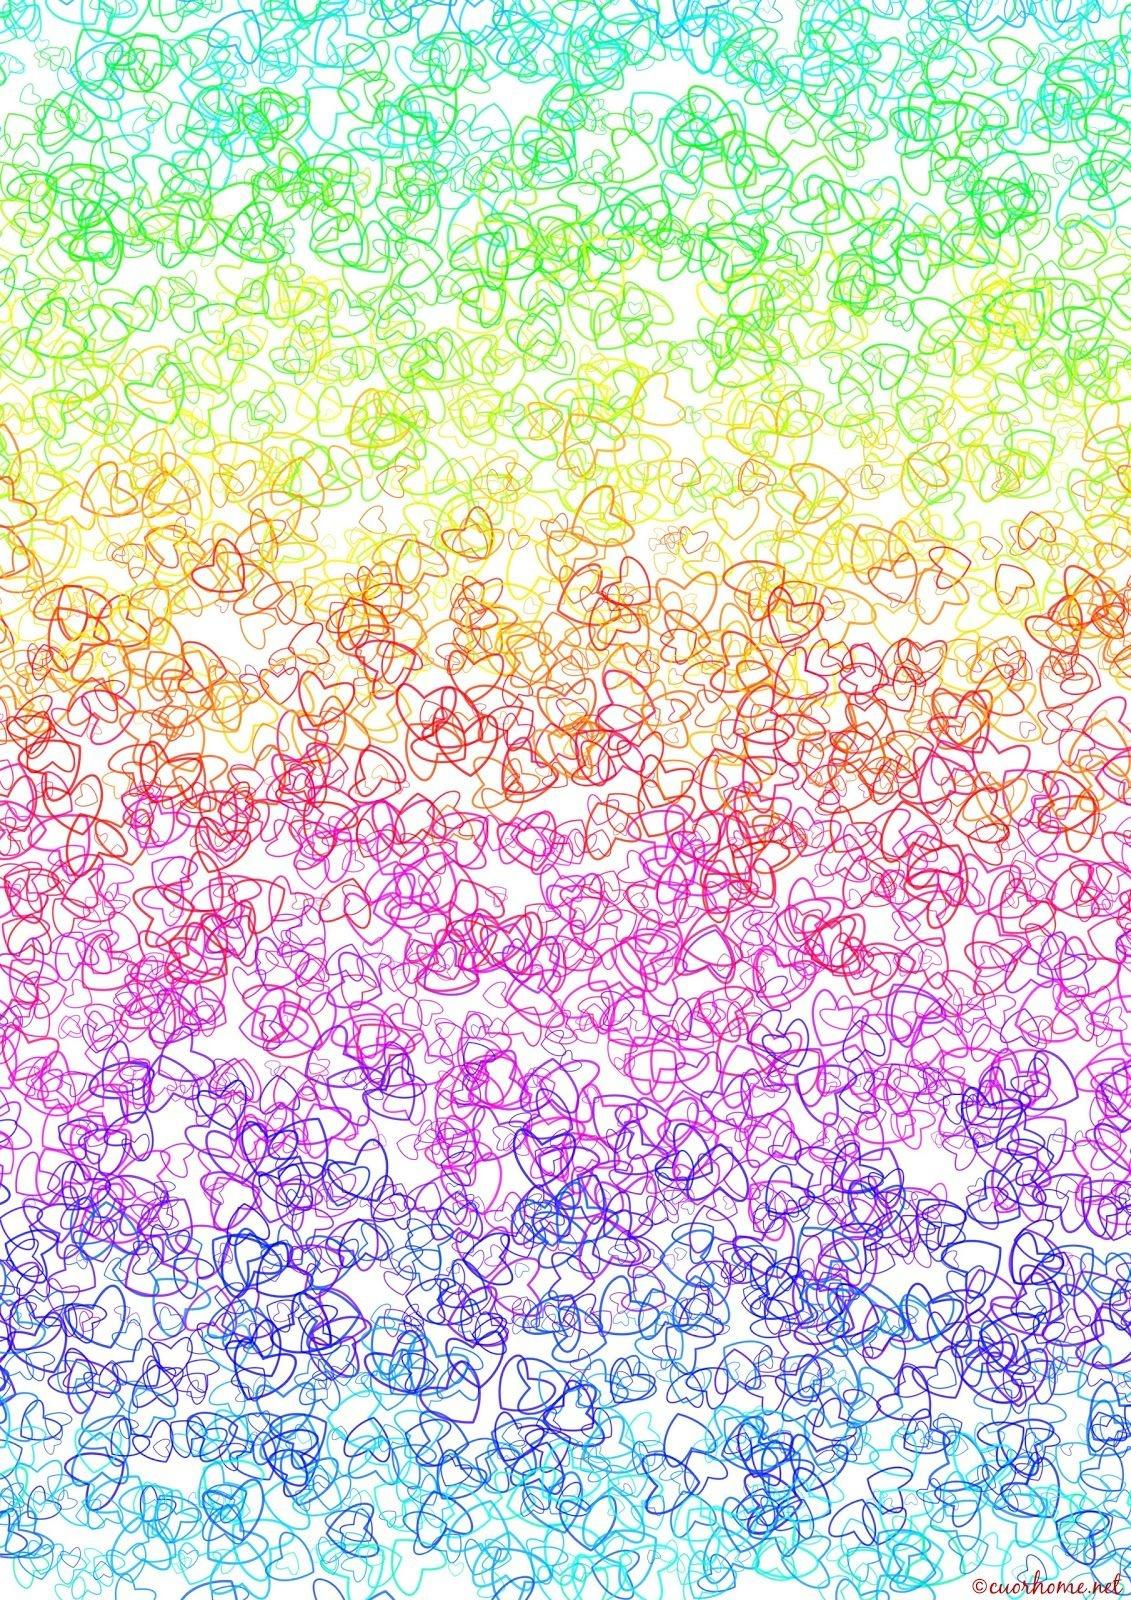 Background Paper Free Printable7 | Scrapbooking | Paper Background - Free Printable Backgrounds For Paper